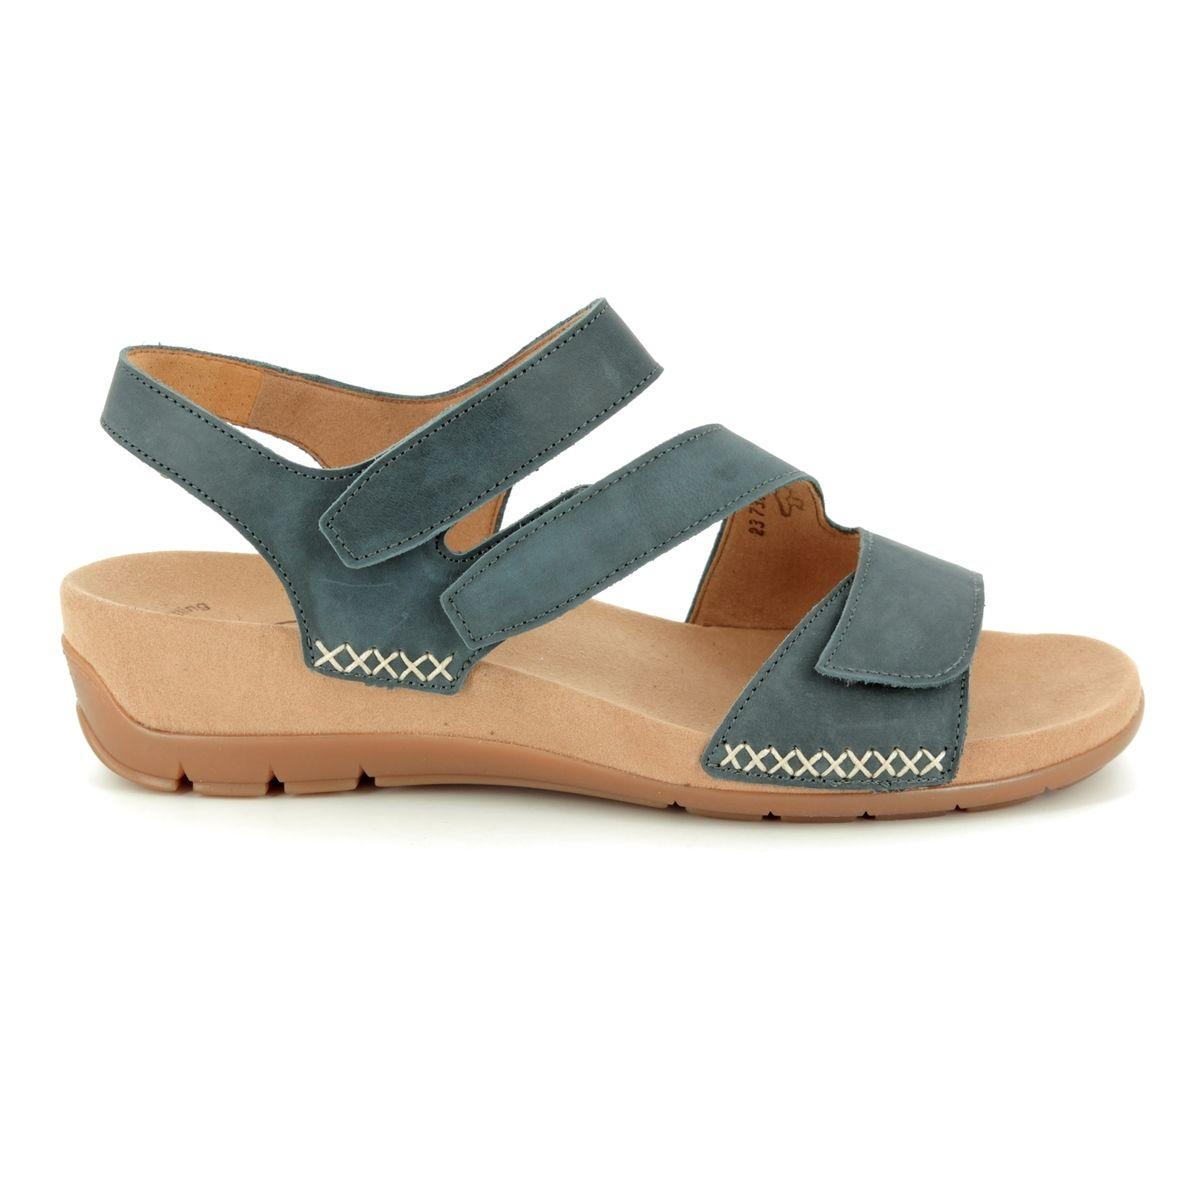 532e4915ac3c Gabor Sandals - Dark grey nubuck - 23.734.36 TOBIN